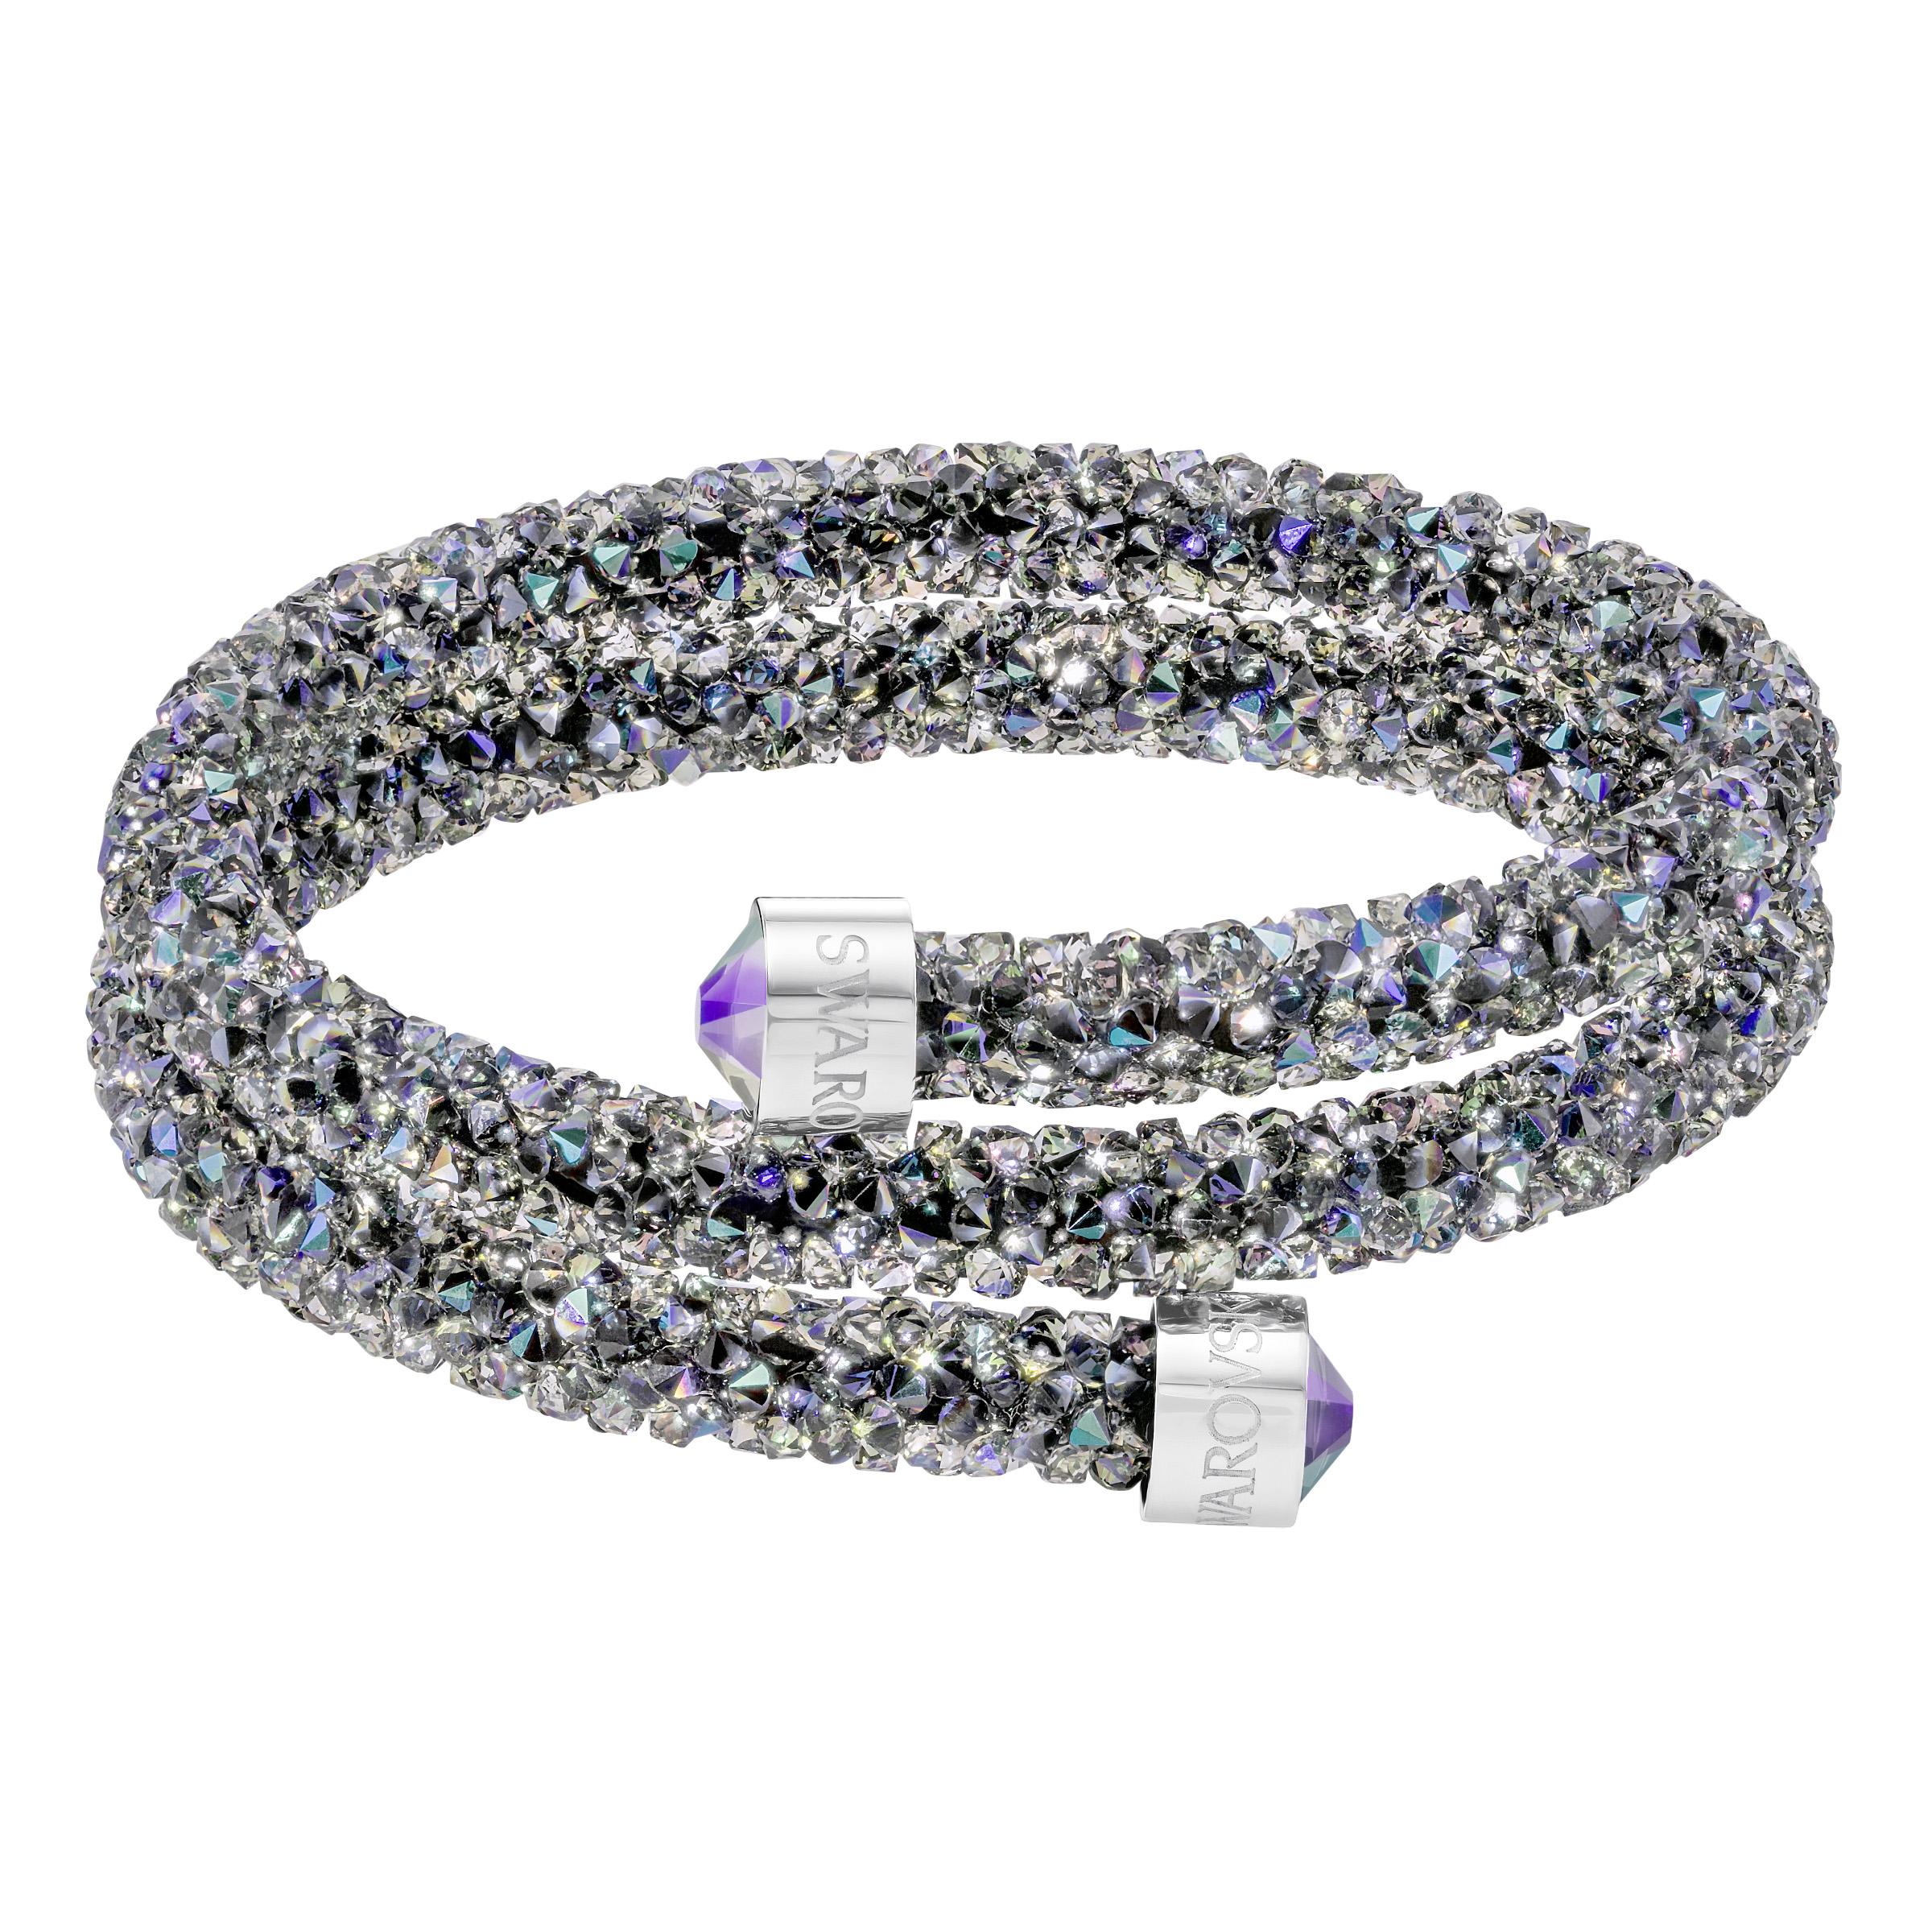 Bracelet-jonc Swarovski double Crystaldust, multicolore, acier inoxydable